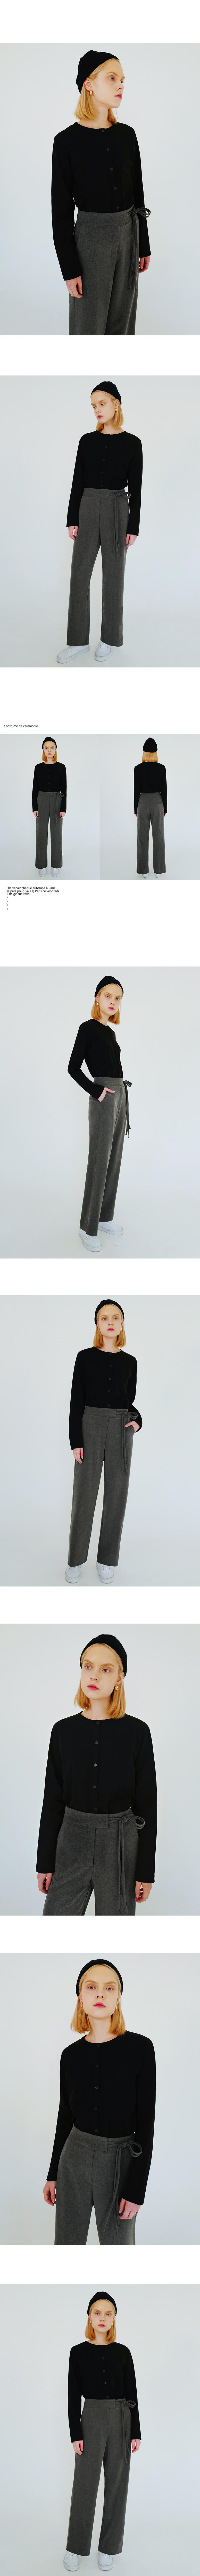 SINGLE LOGO CARDIGAN T (MUSTARD) - 루흠, 39,000원, 상의, 니트/스웨터